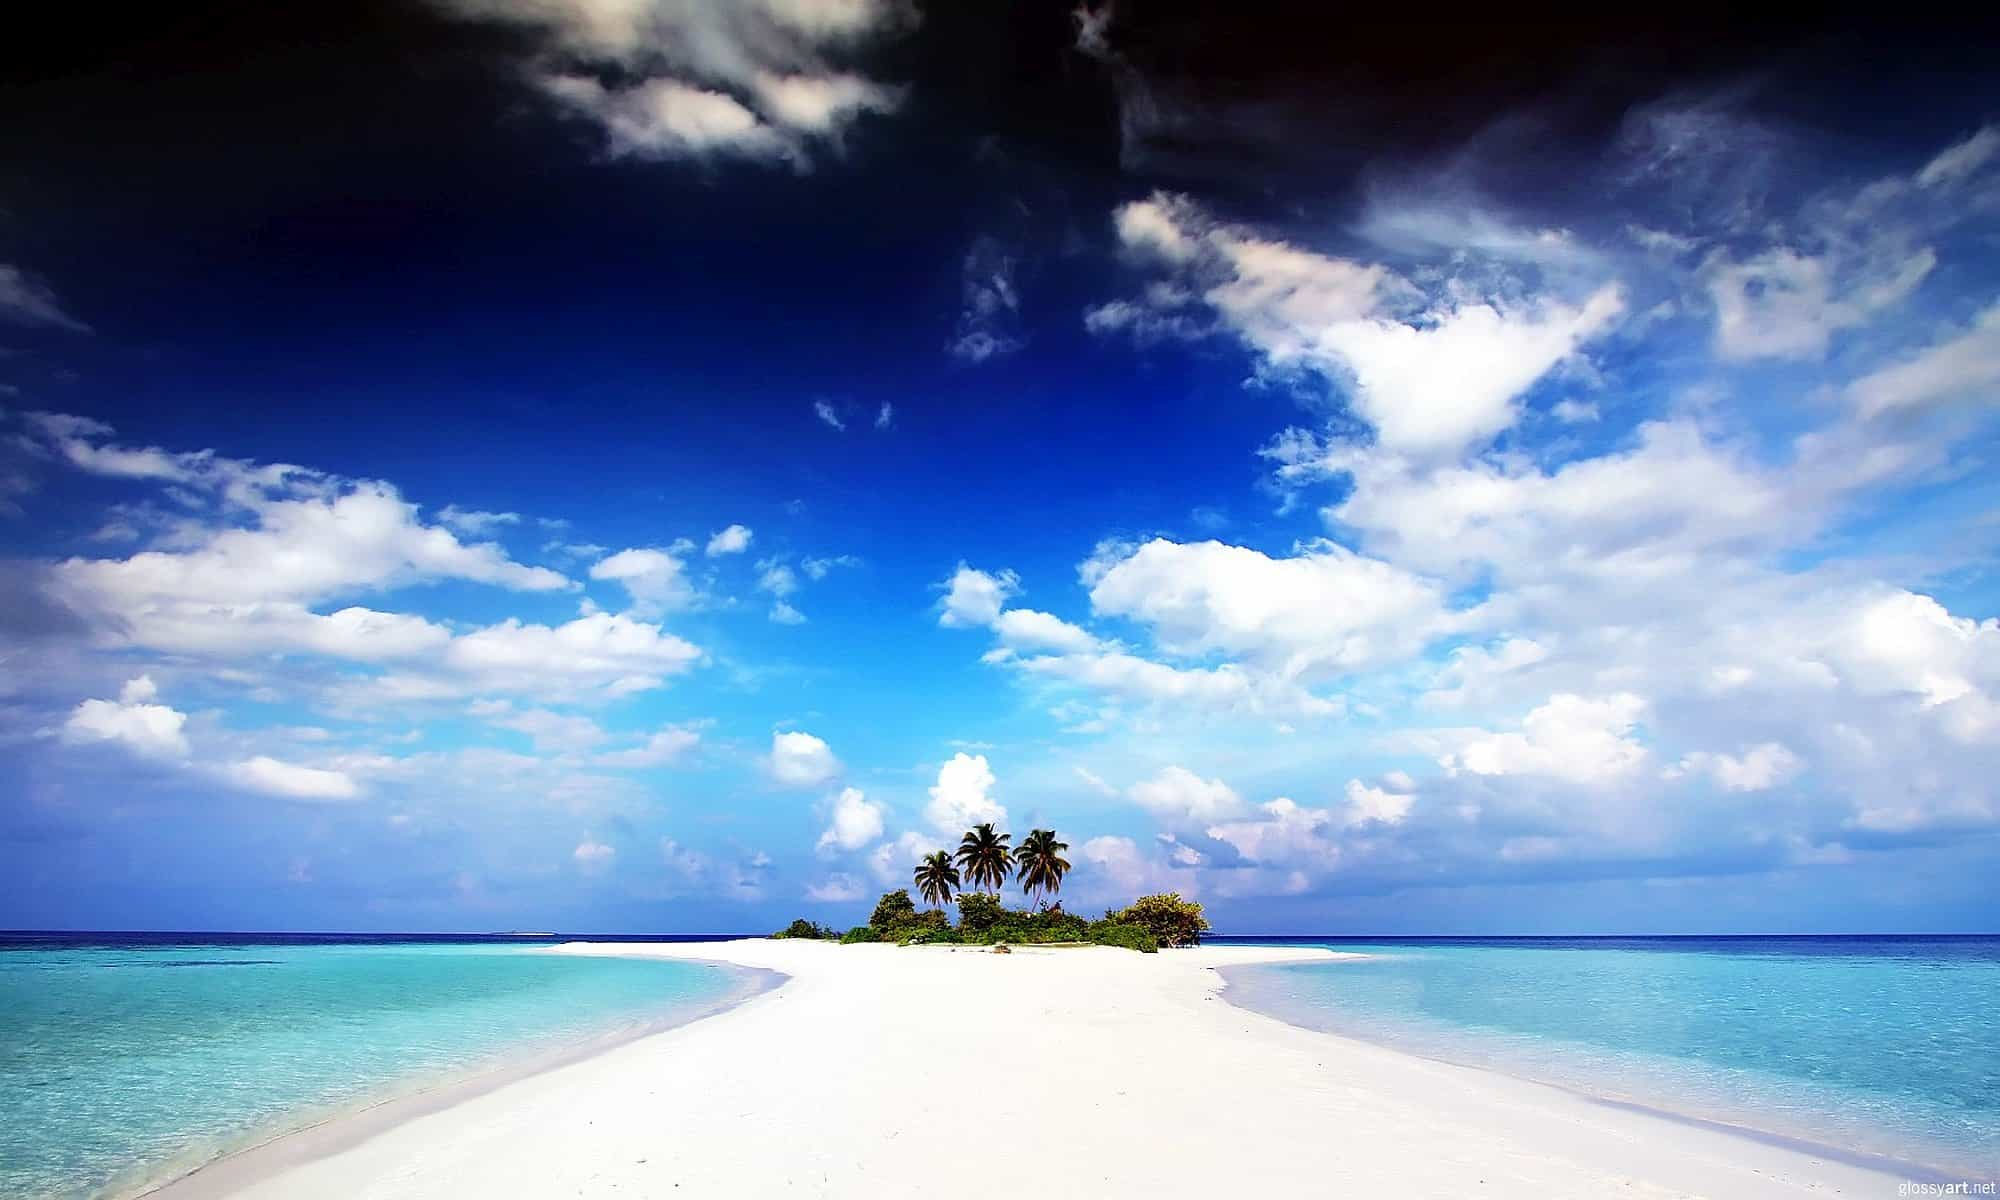 island-hopping-rural-philippines-free-wallpaper-beaches-islands-10